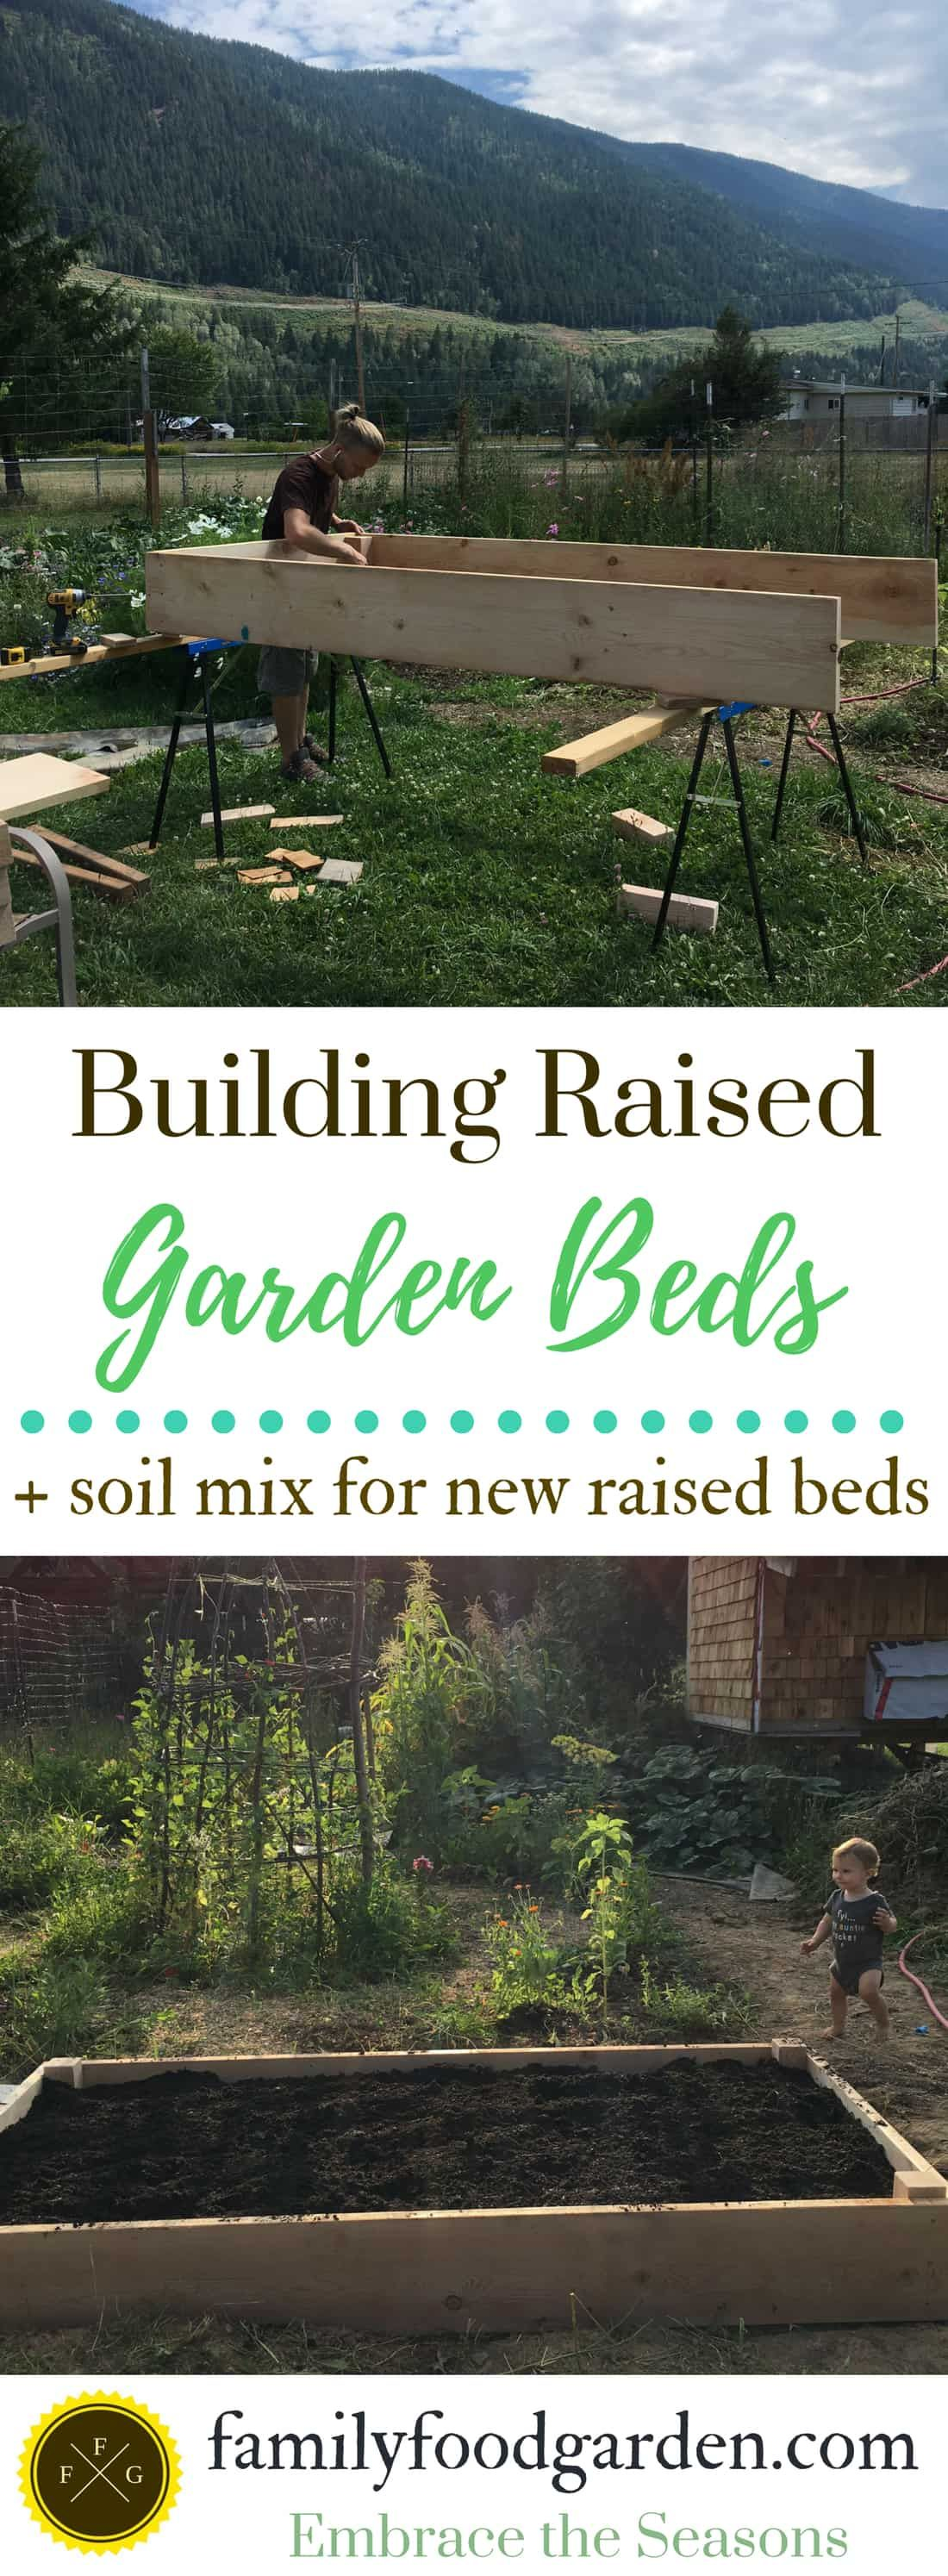 Building Raised Garden Beds & Soil Mix Raised garden bed